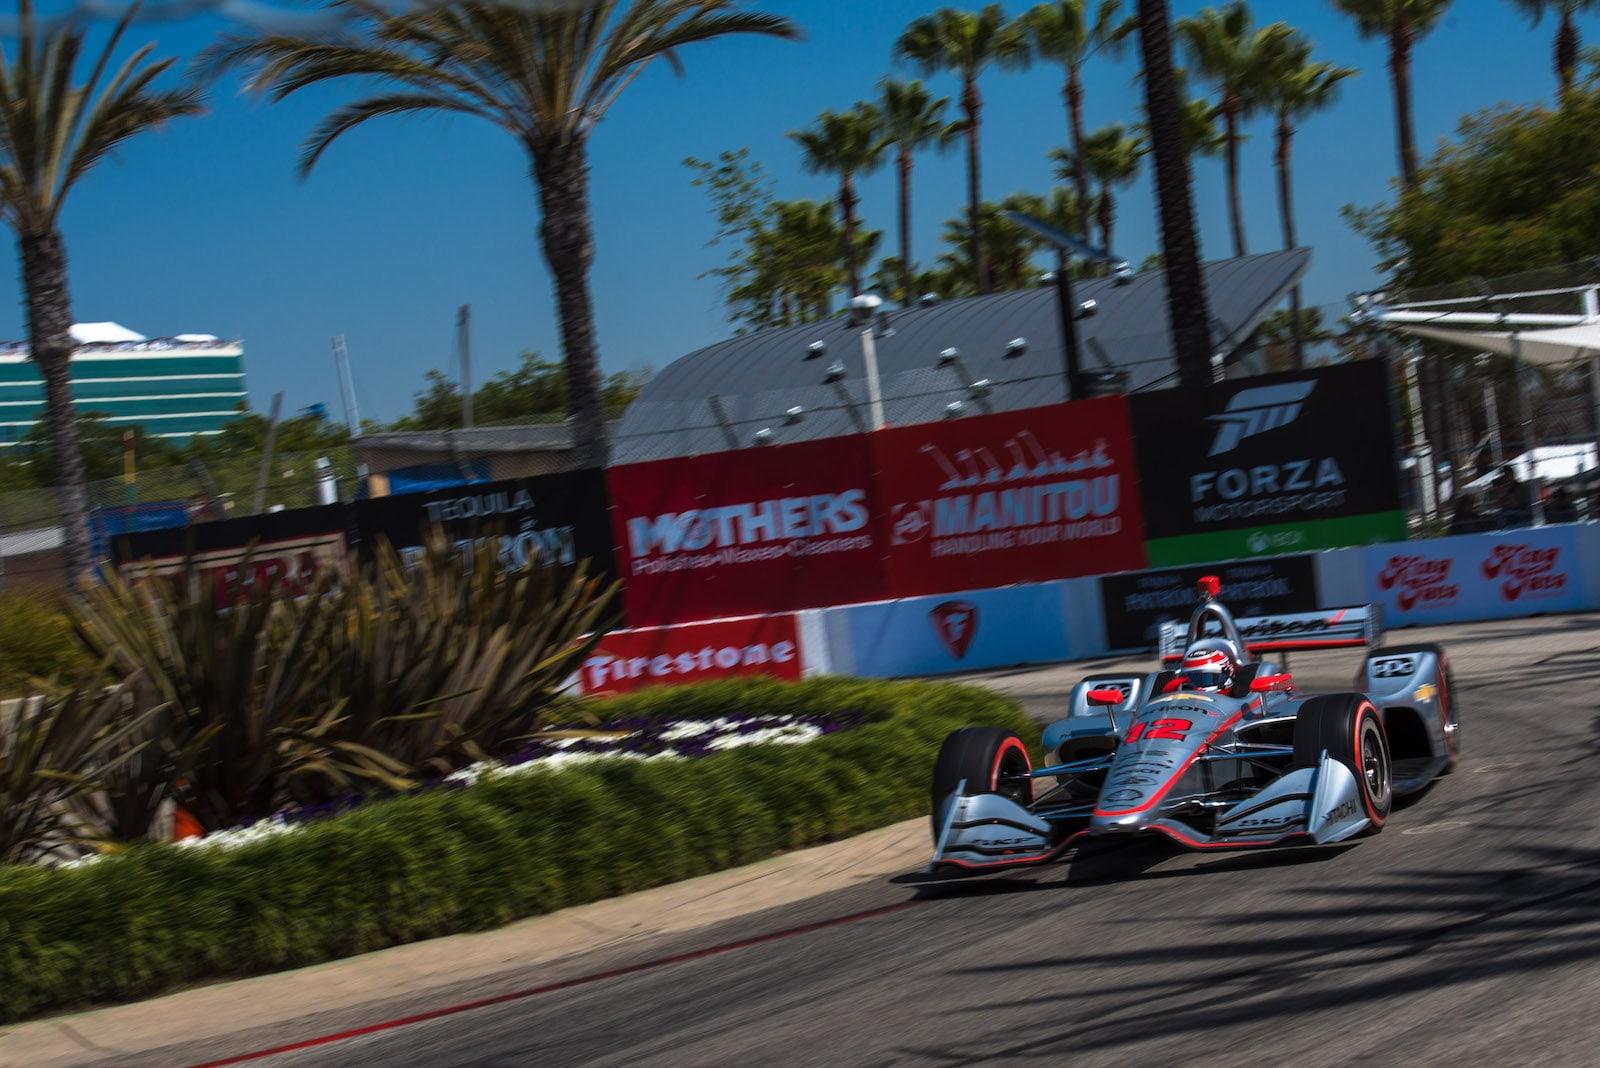 Will-Power-Long-Beach-fountain-Verizon-Indy-car.jpg